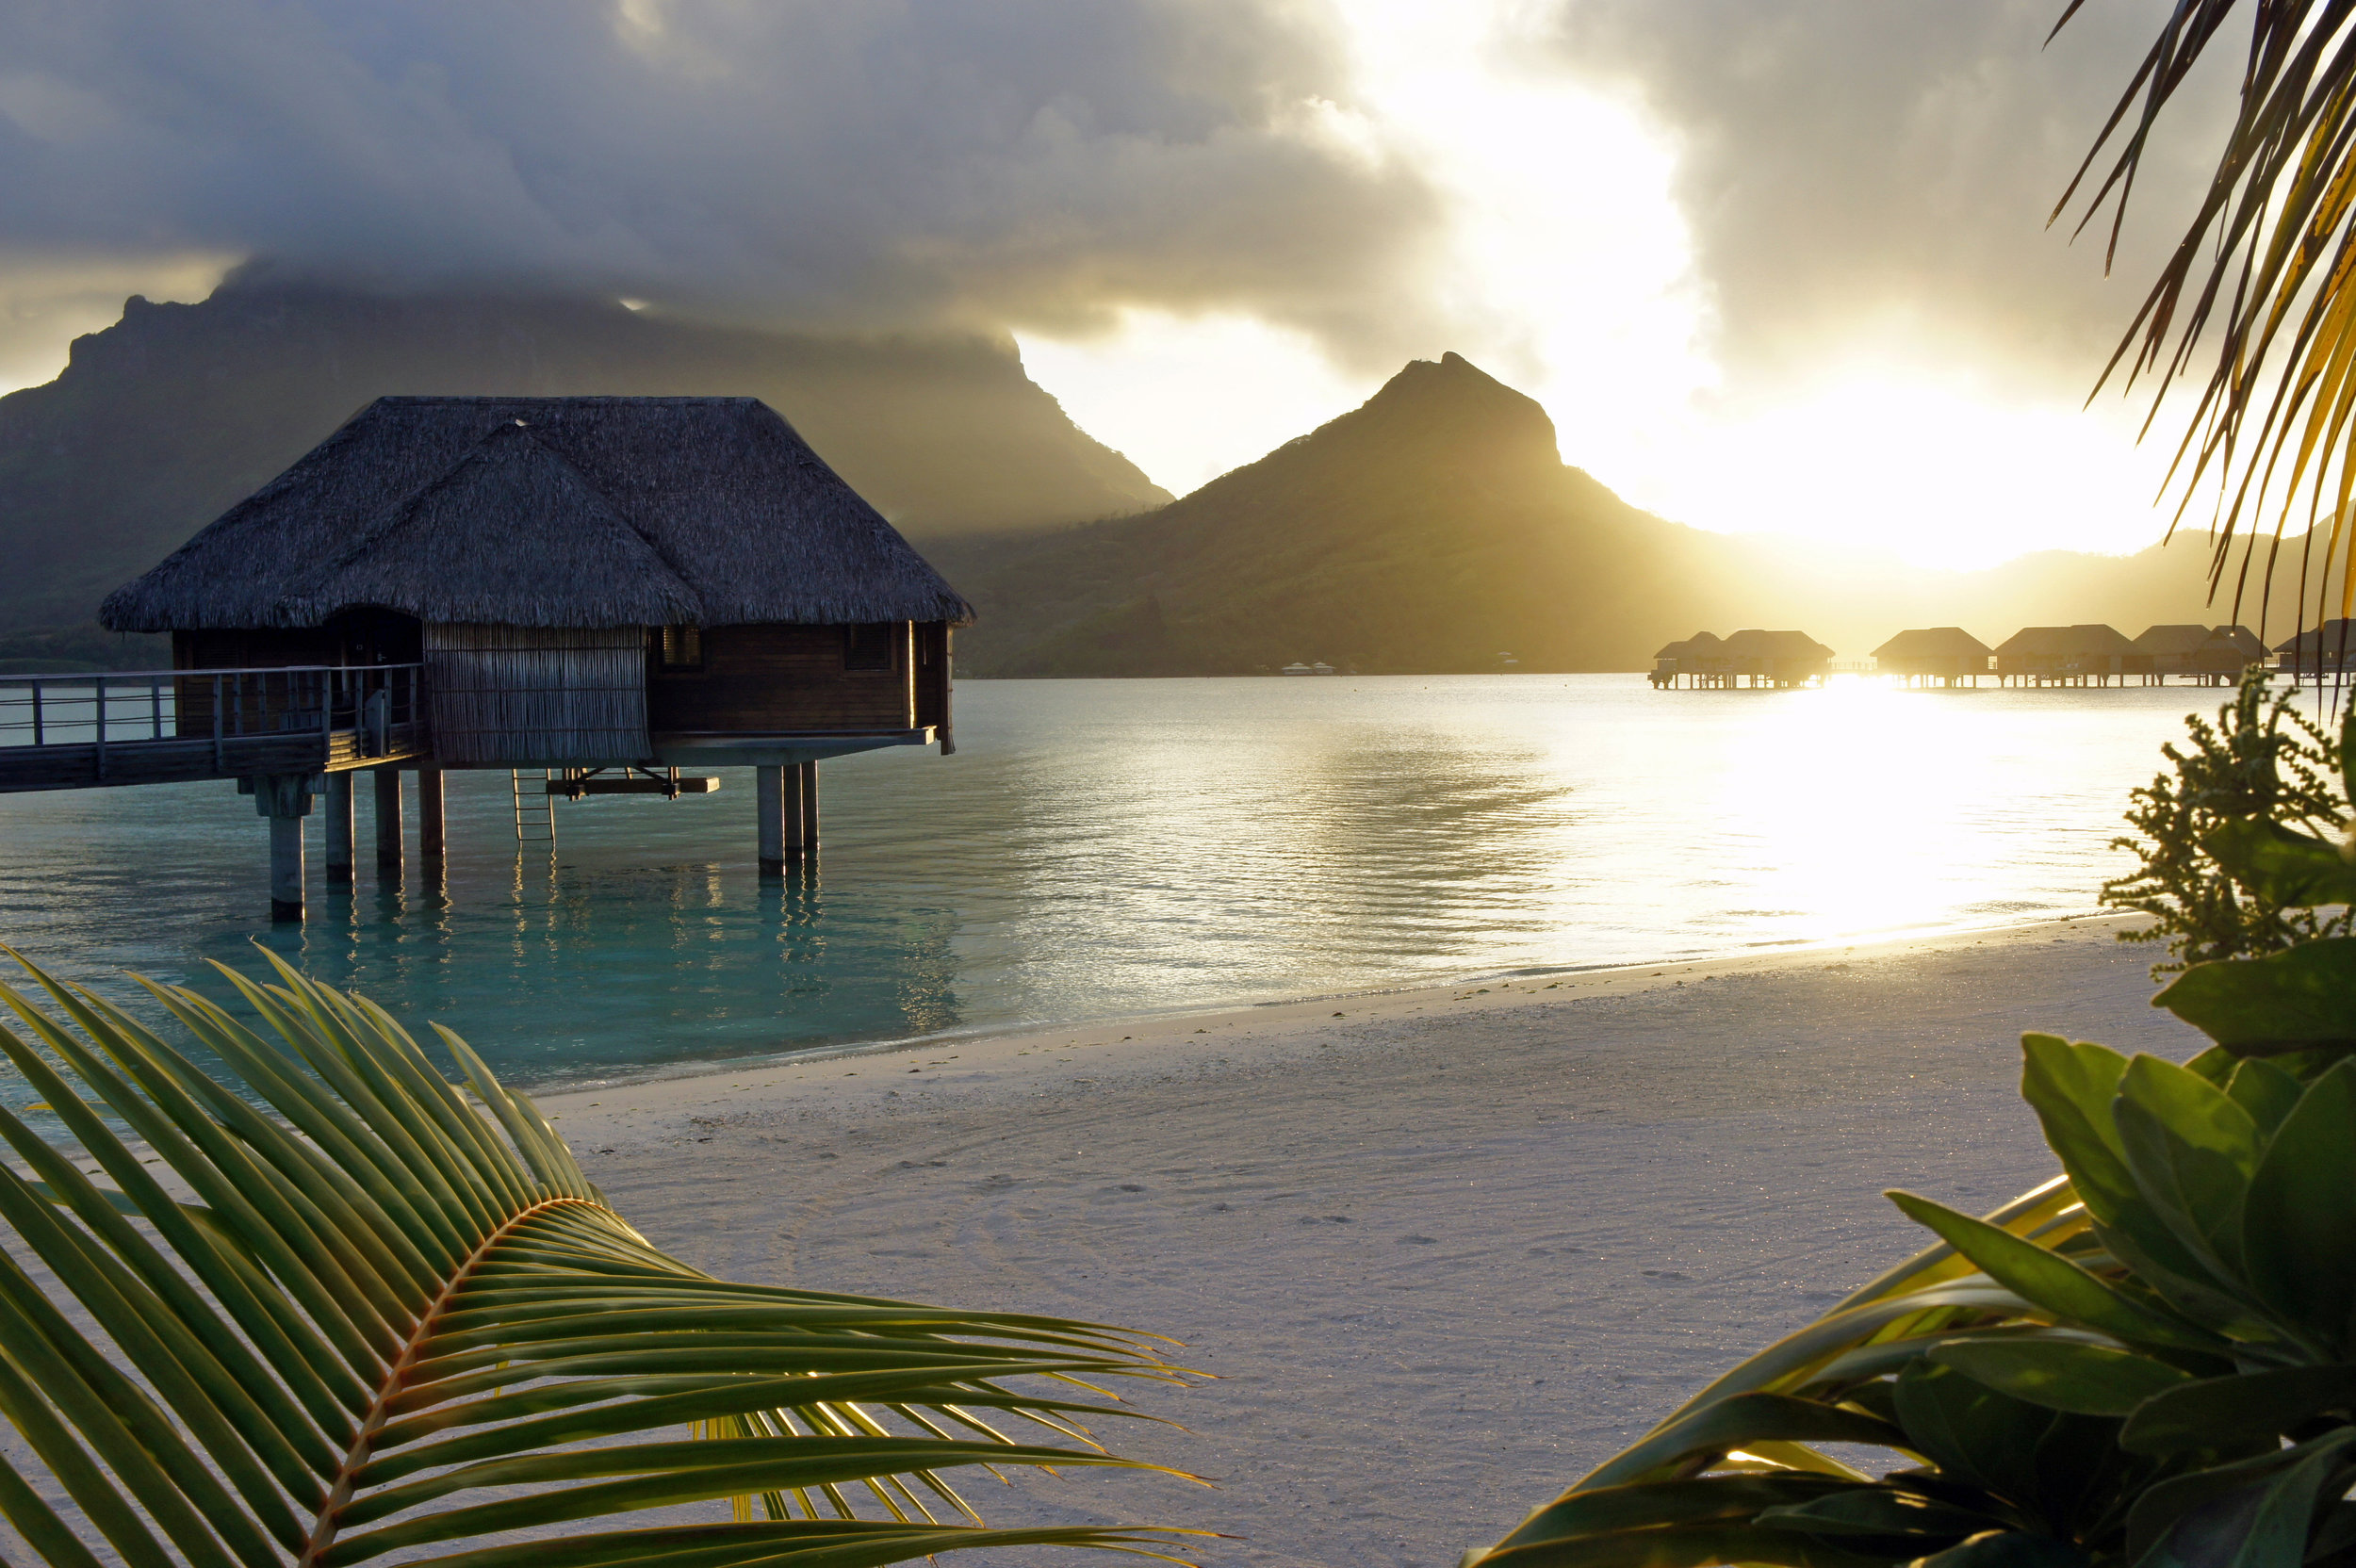 The Tahitian Islands